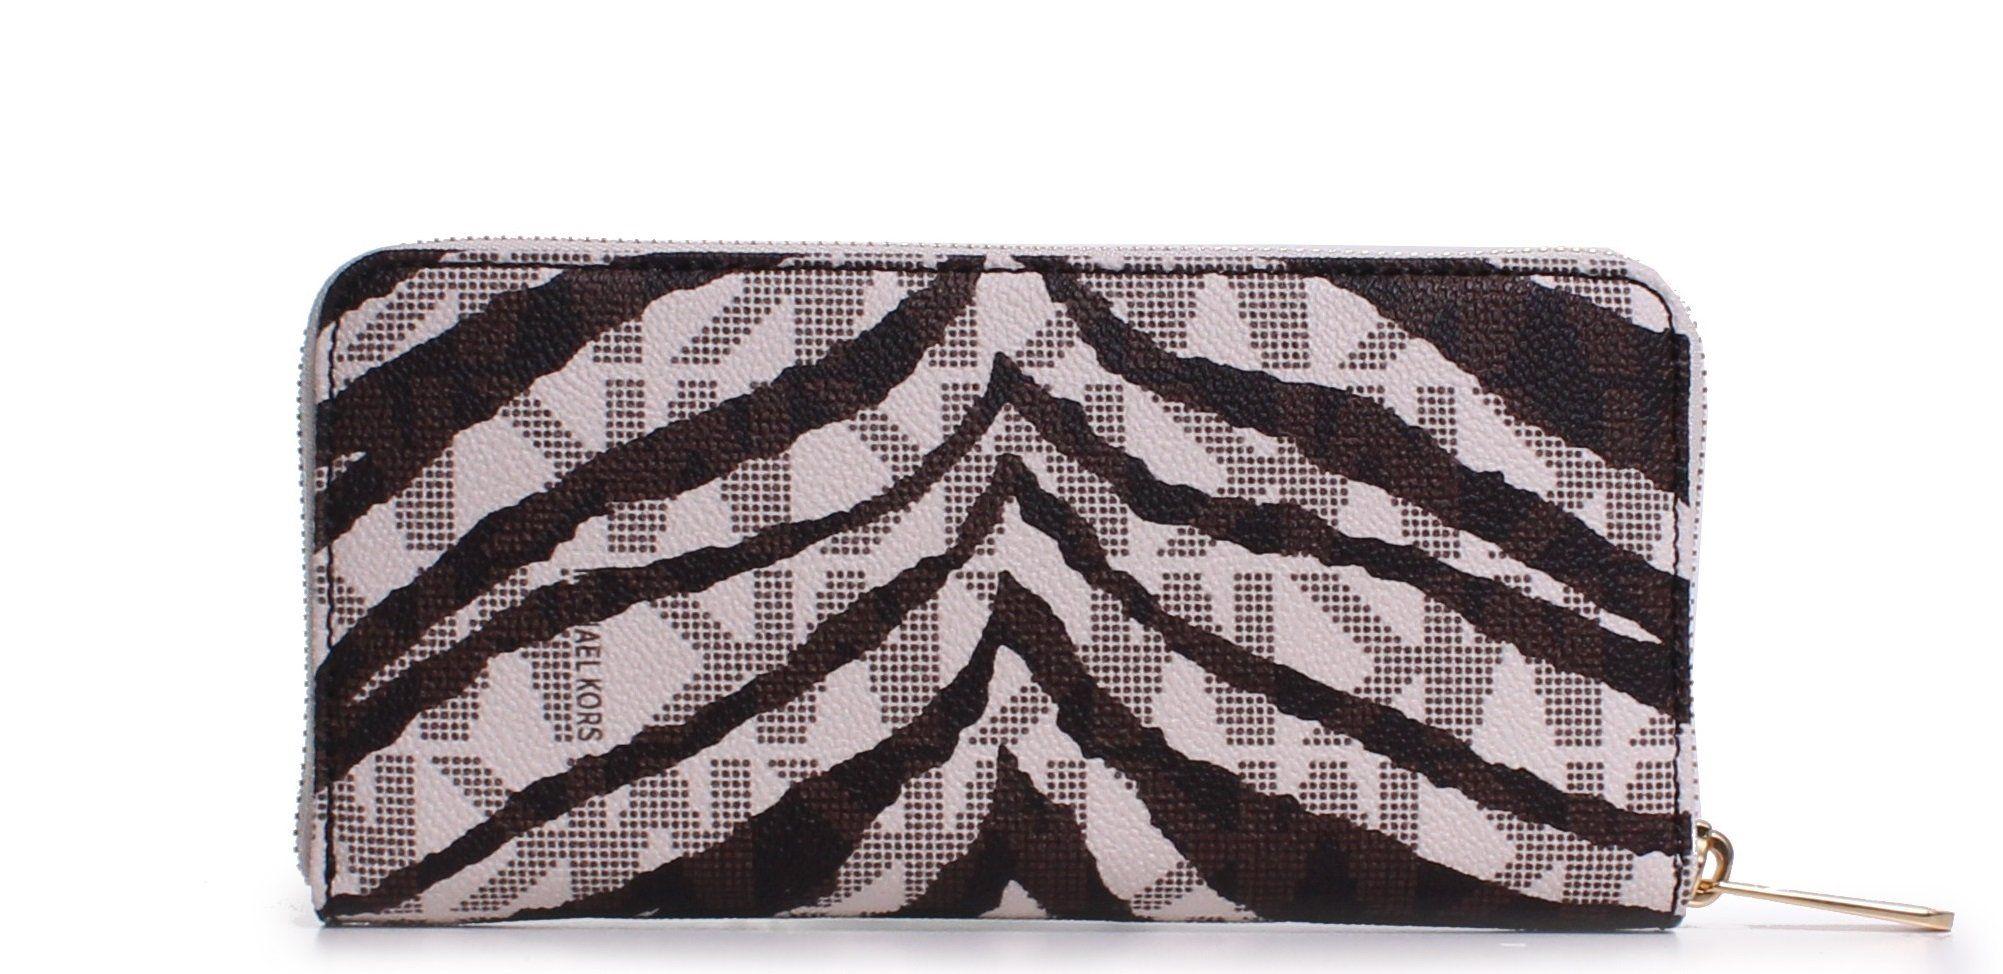 046fab142386a6 Michael Kors Jet Set Continental Wallet Vanilla MK Signature Tiger ** Click  image for more details. (This is an affiliate link) #MichaelKorsHandbags